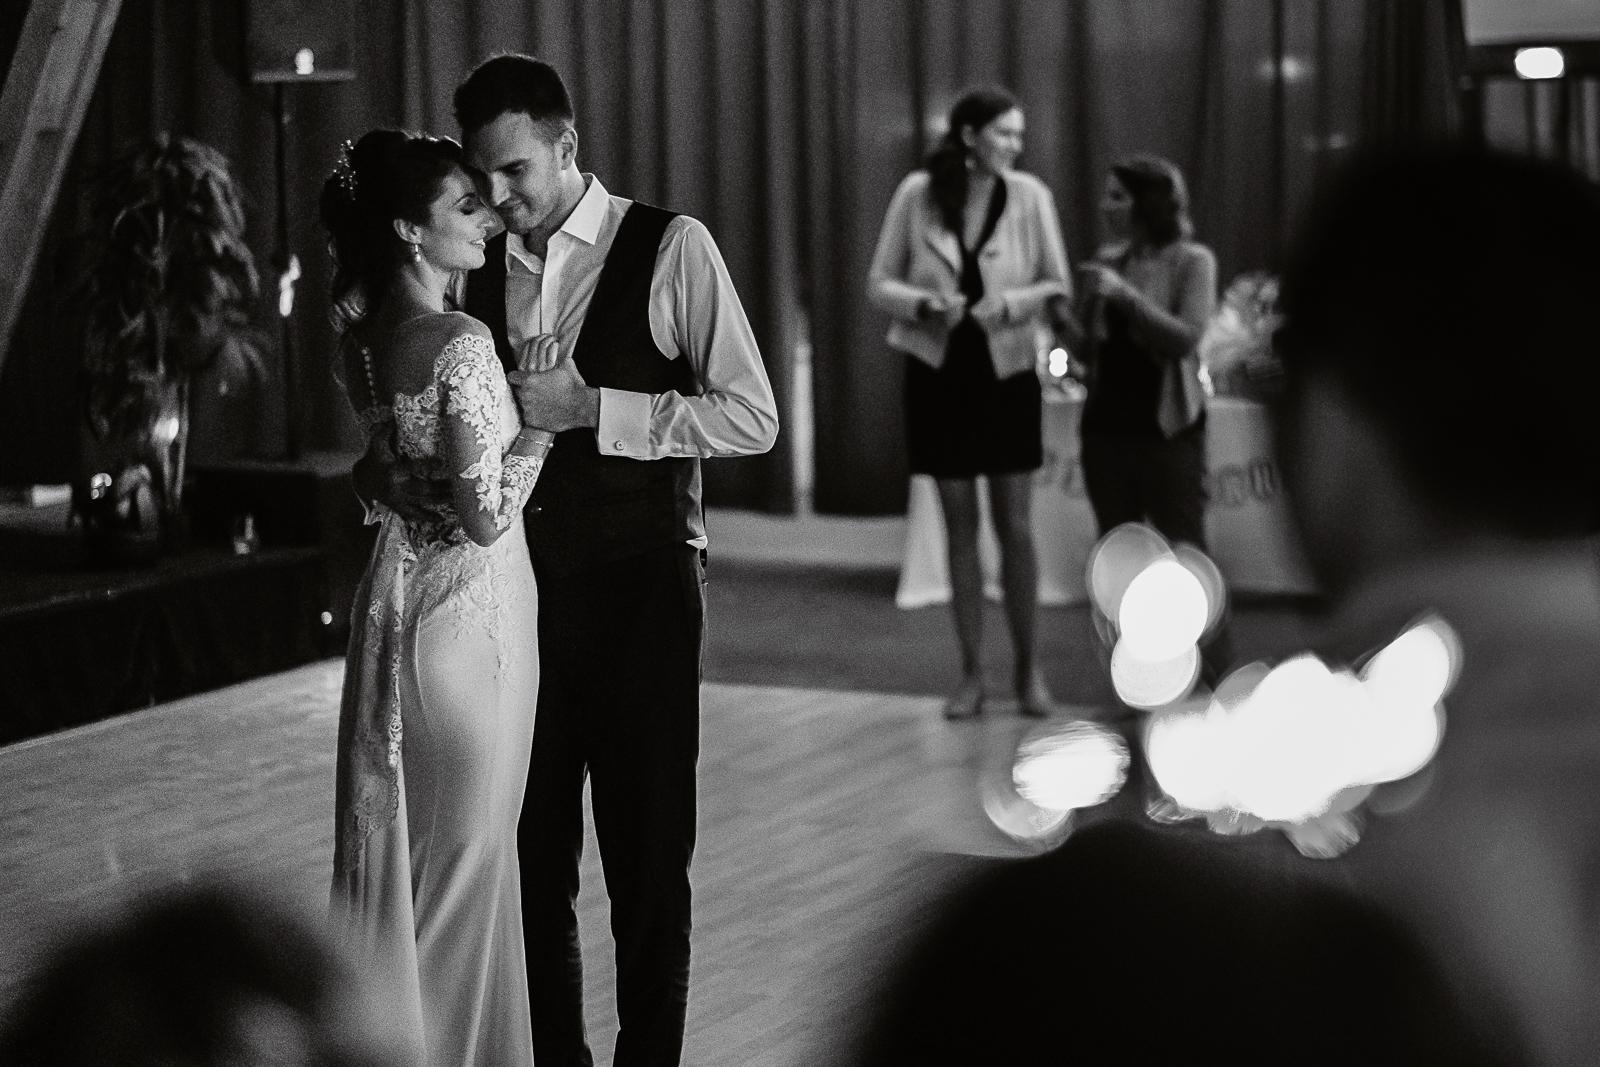 Steeve-Constanty-photographe-mariage-professionnel-portrait-evenementiel-thann-cernay-alsace-photographe-mariage-alsace